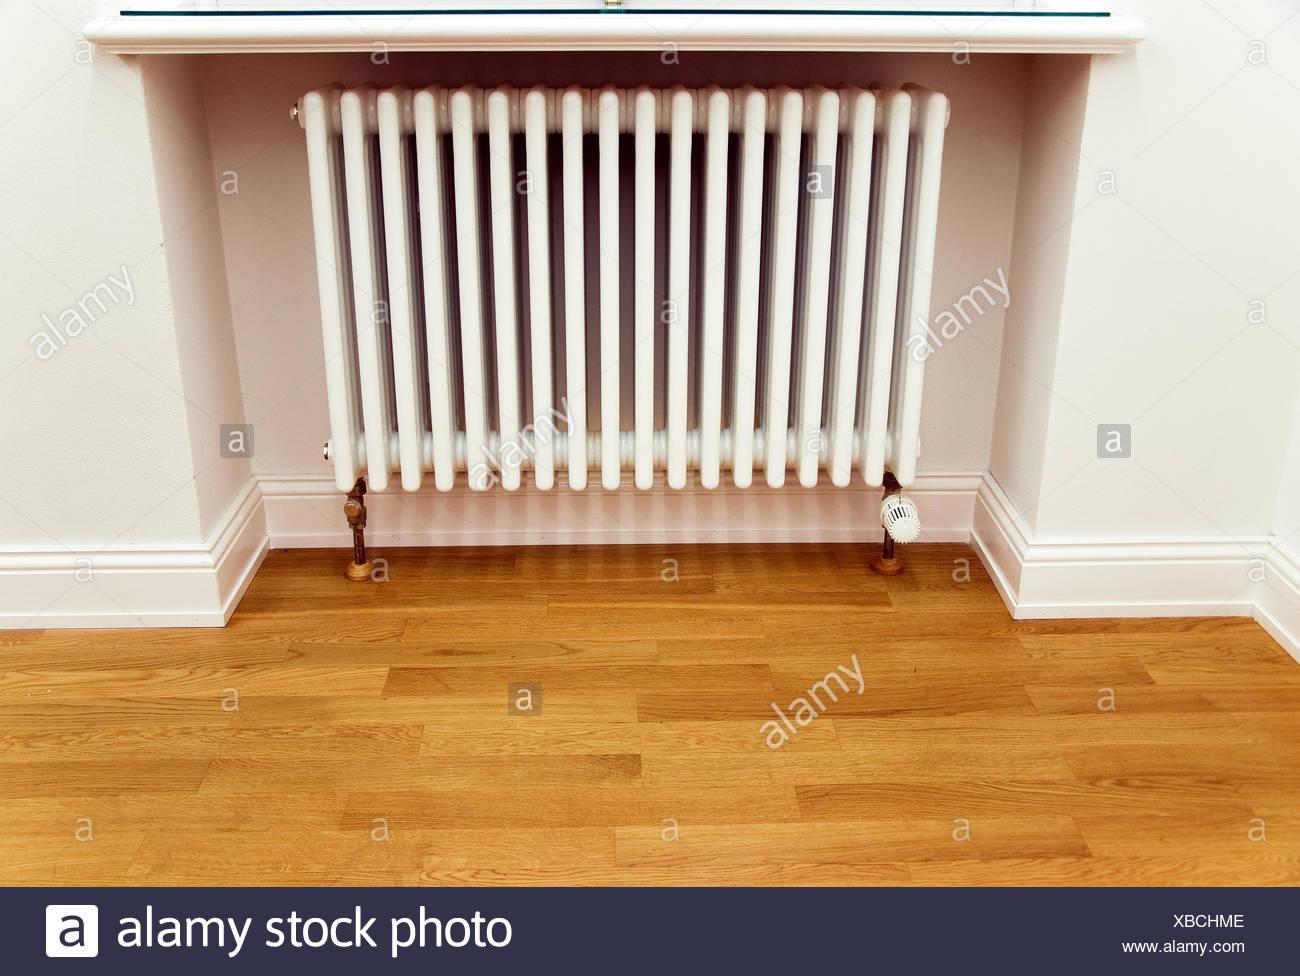 radiator parquet - Stock Image